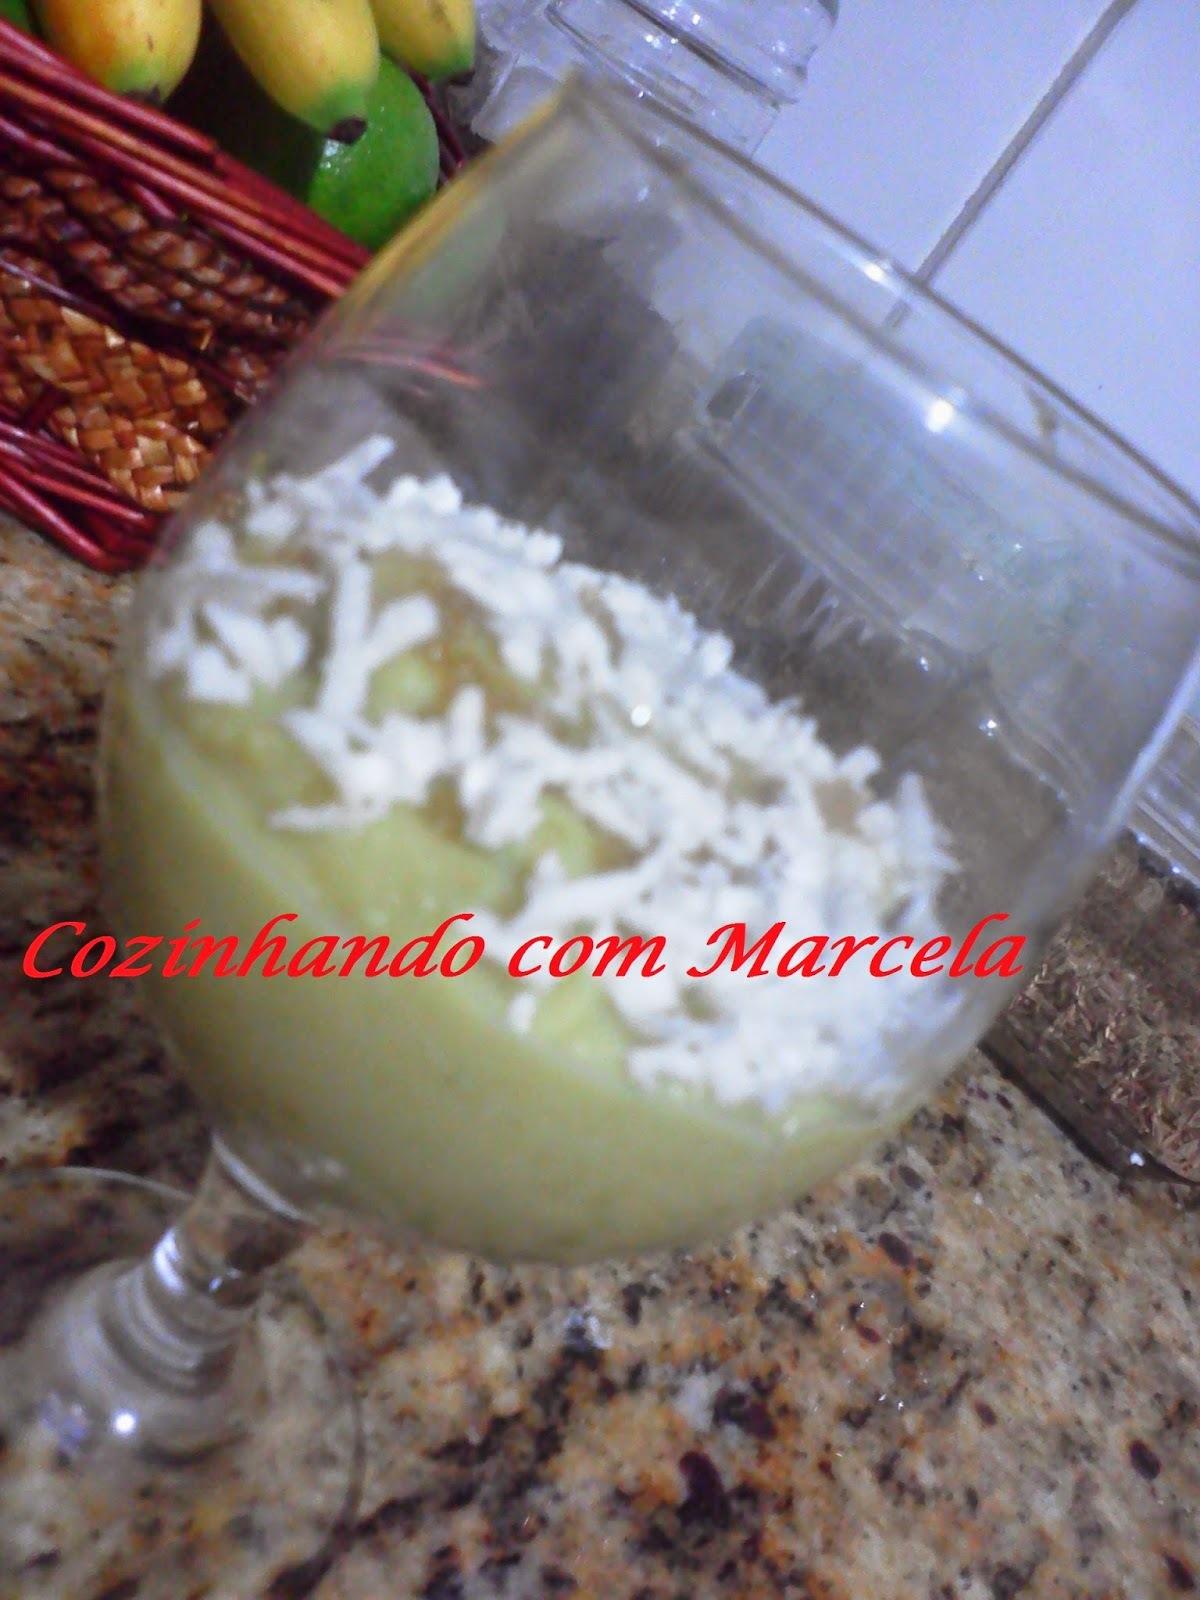 MOUSSE DE BATATA DOCE COM COCO